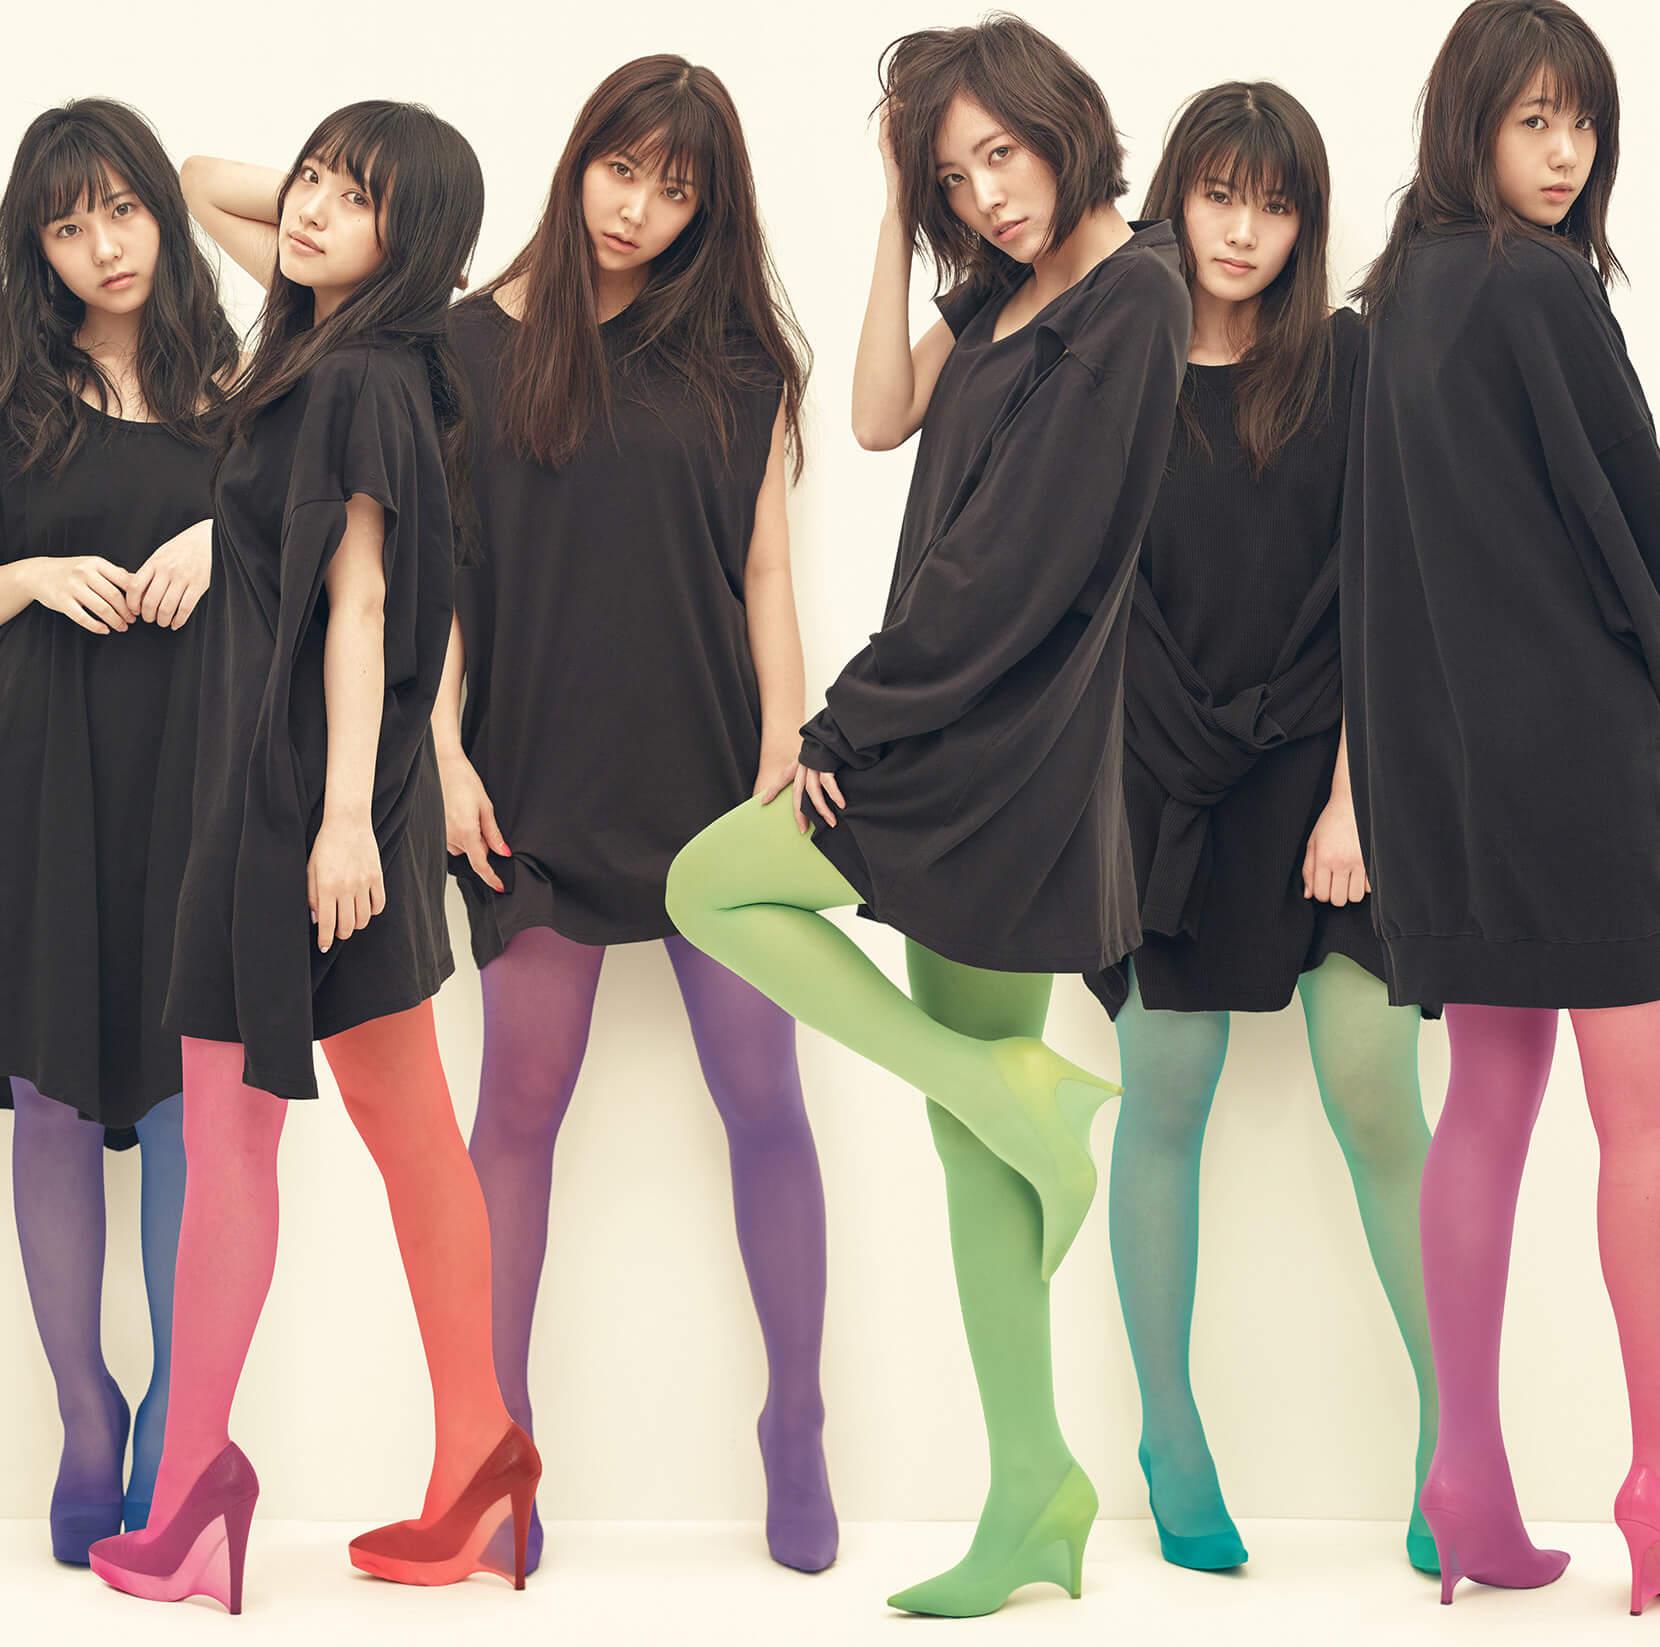 50th Single「11月のアンクレット」 Type E【初回限定盤】